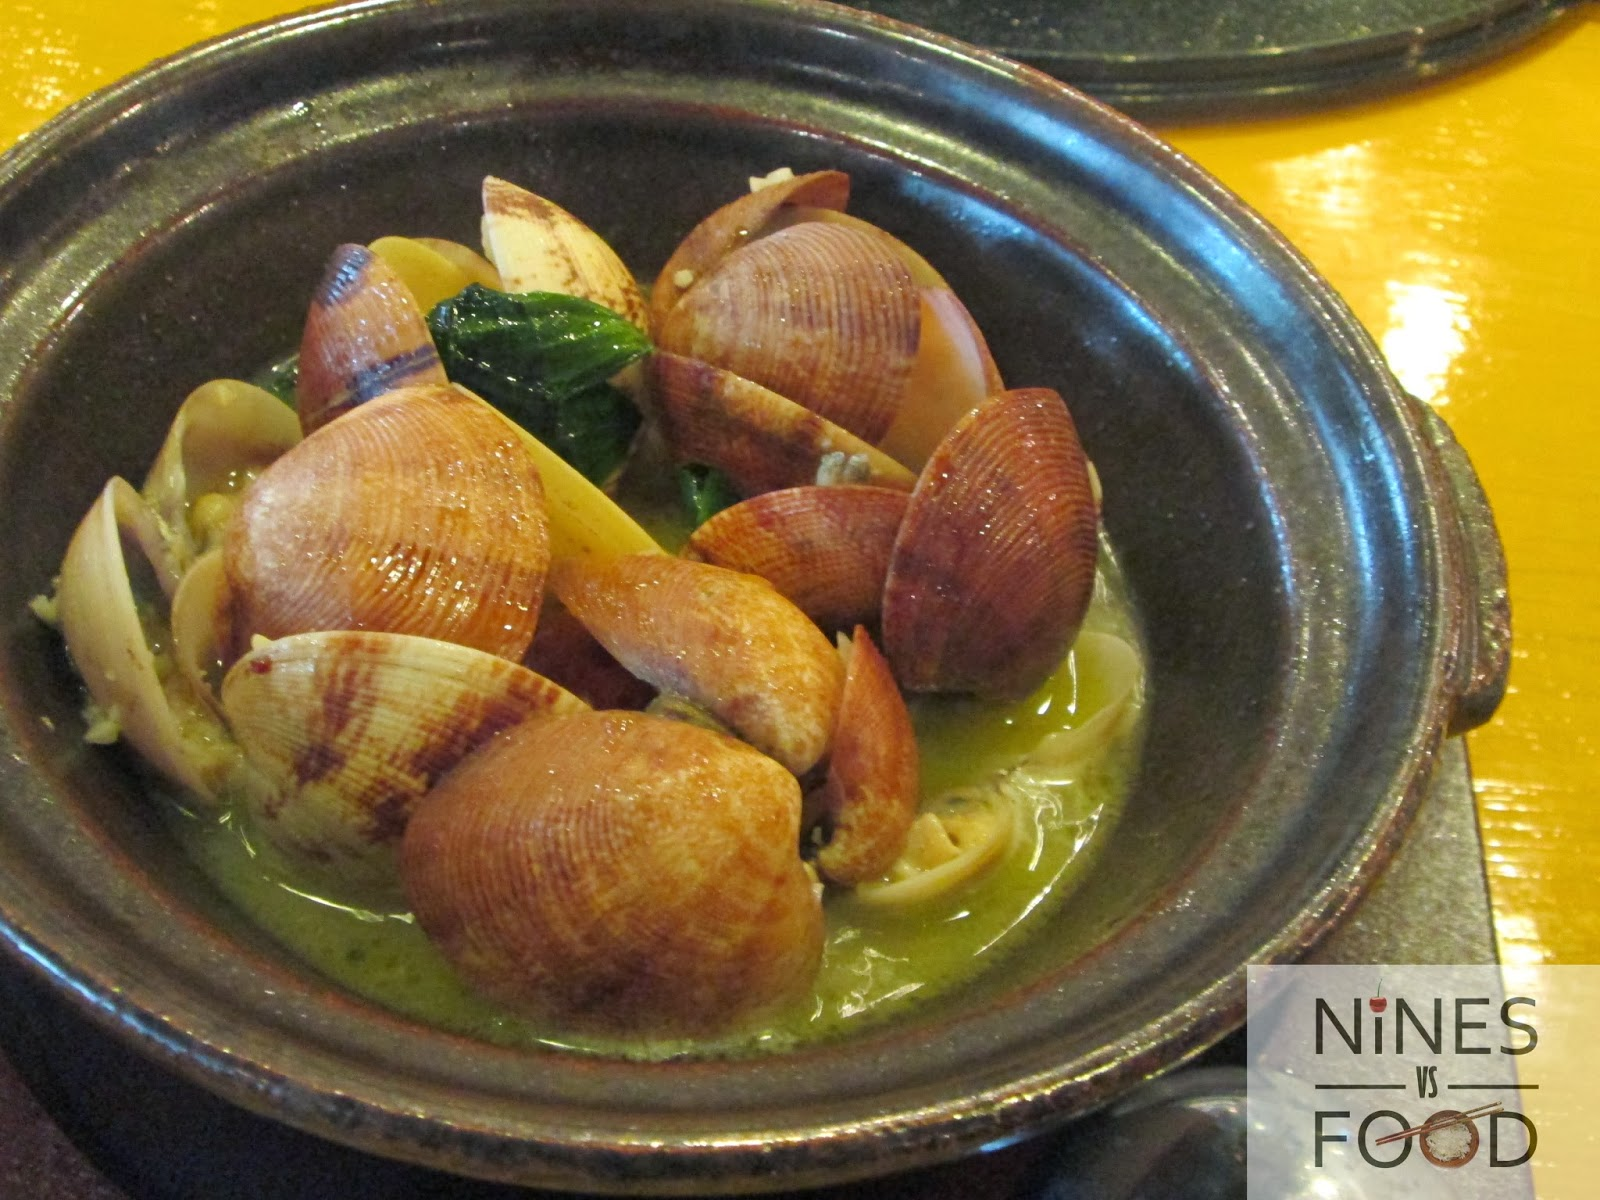 Nines vs. Food - Yomenya Goemon Greenbelt 3 - 15.jpg